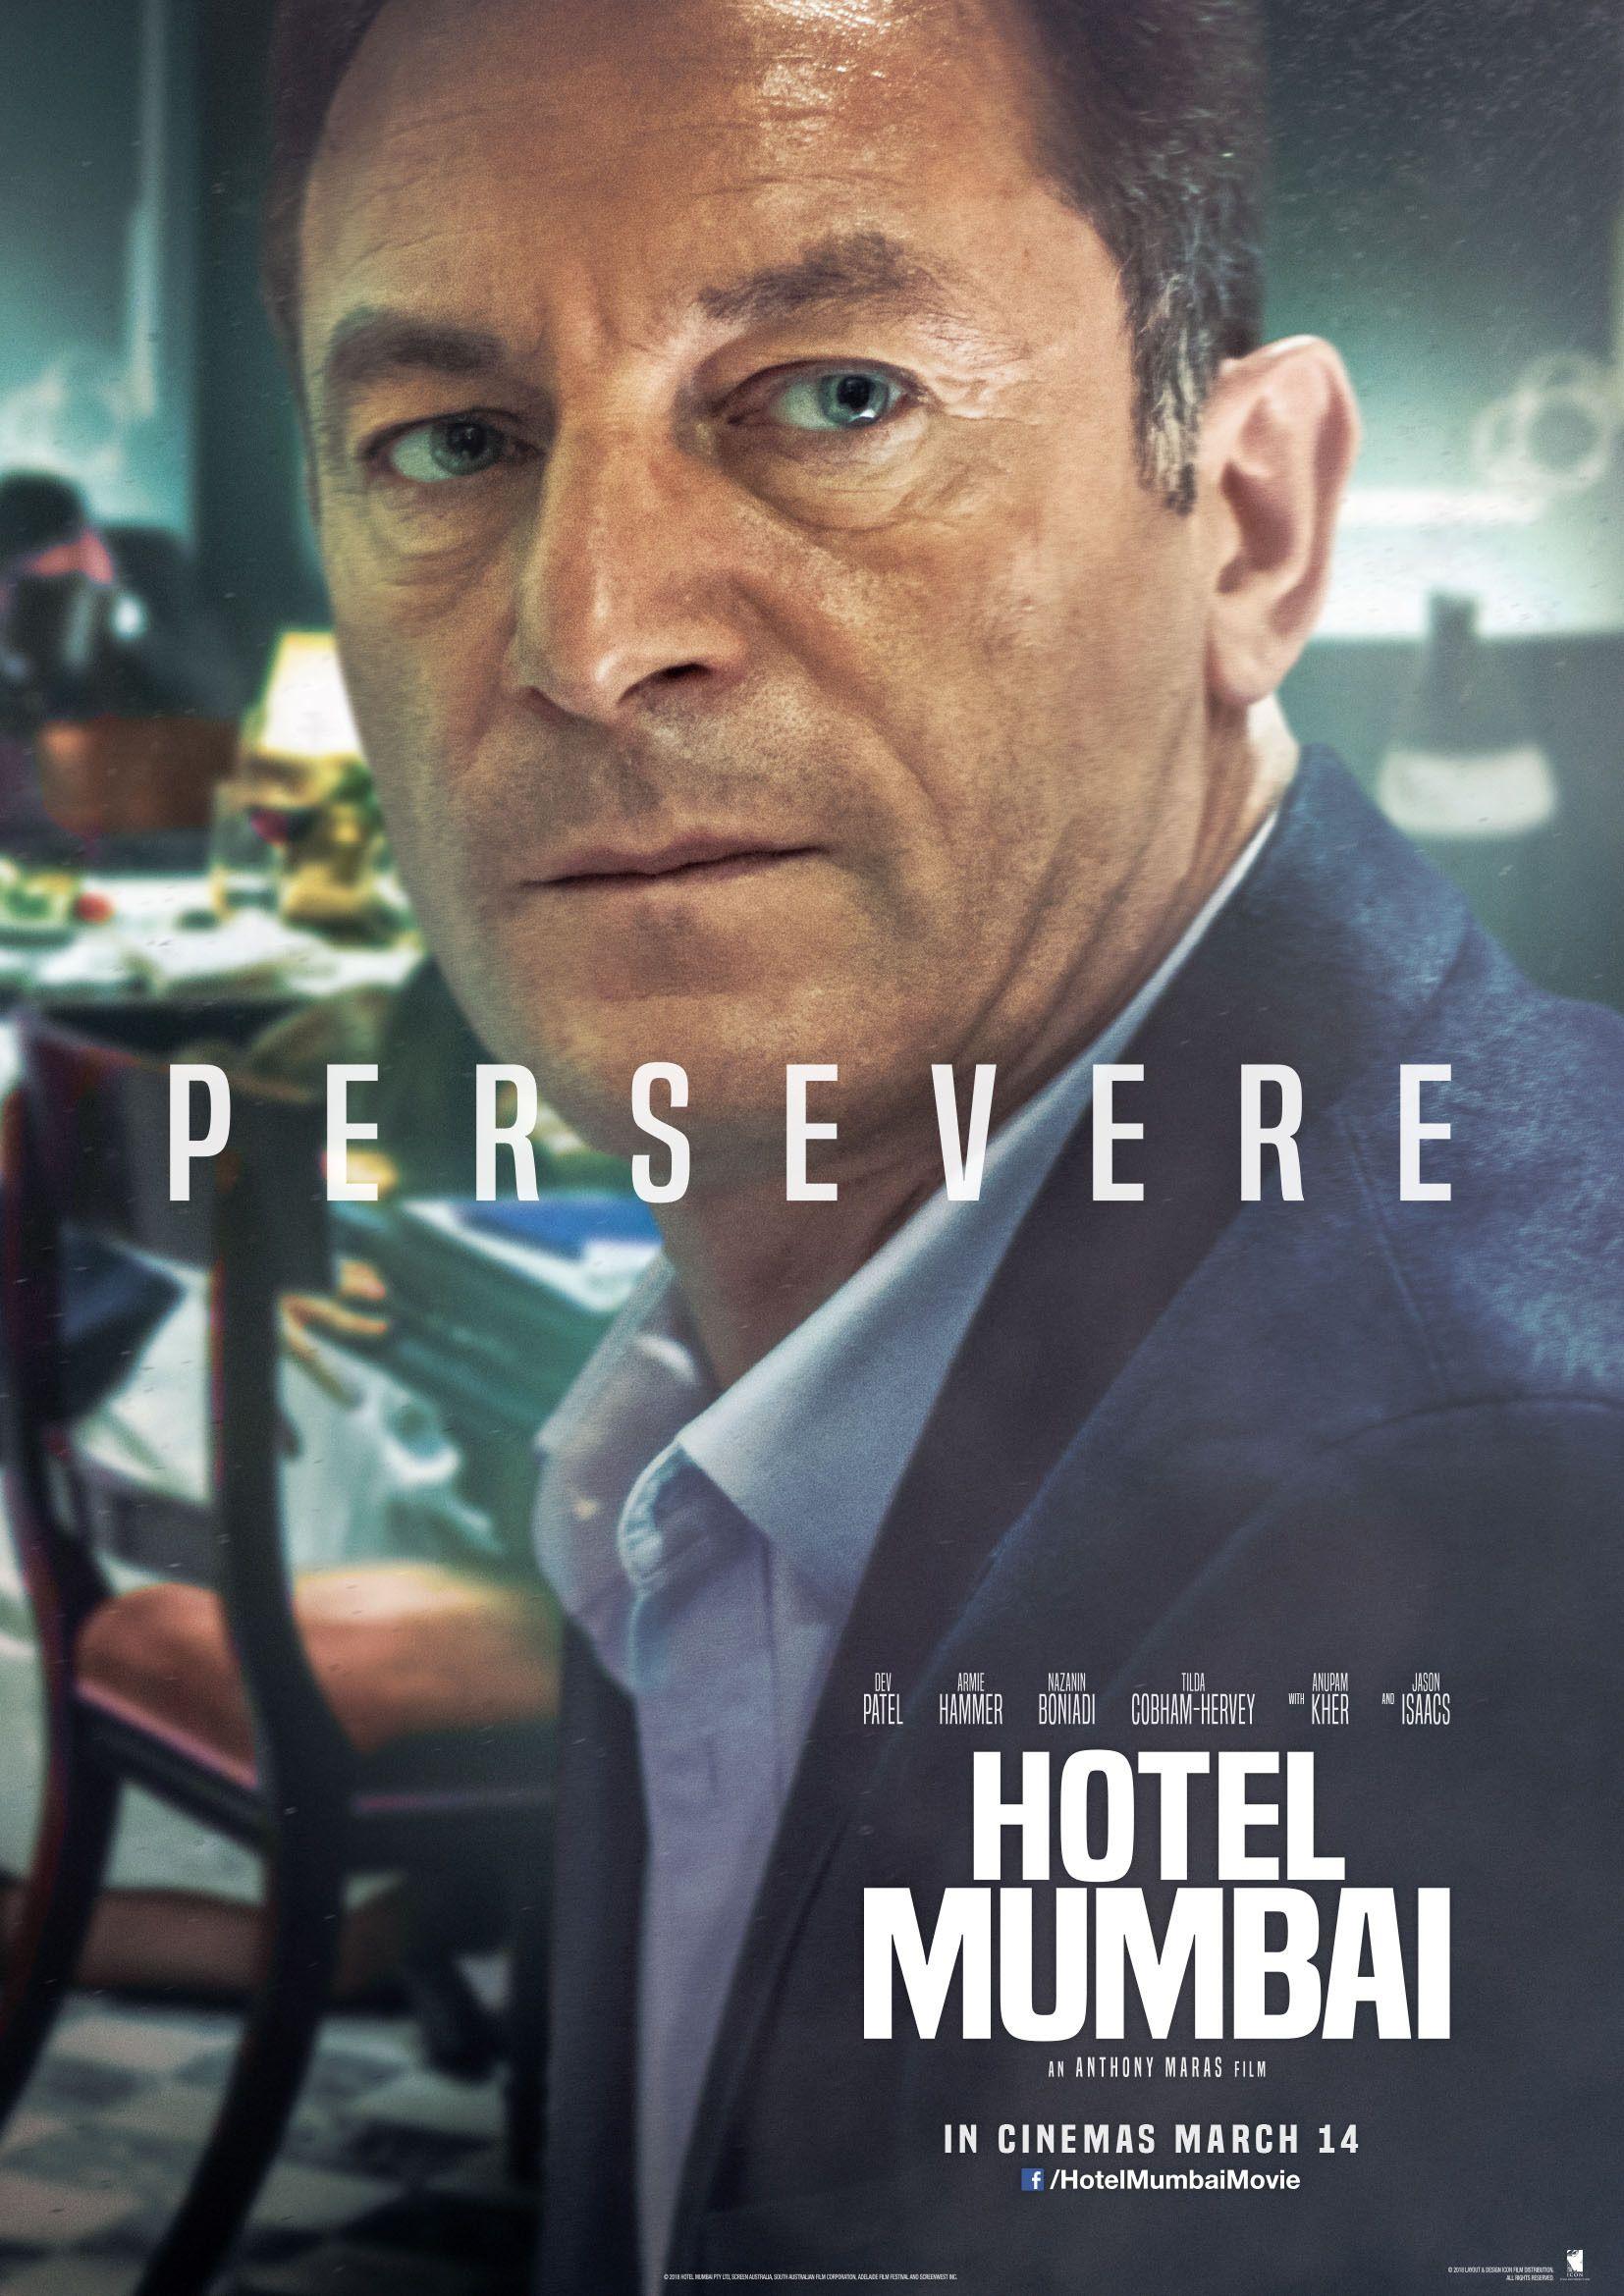 Hotel Mumbai 2018 Movies Online Free Movies Online Full Movies